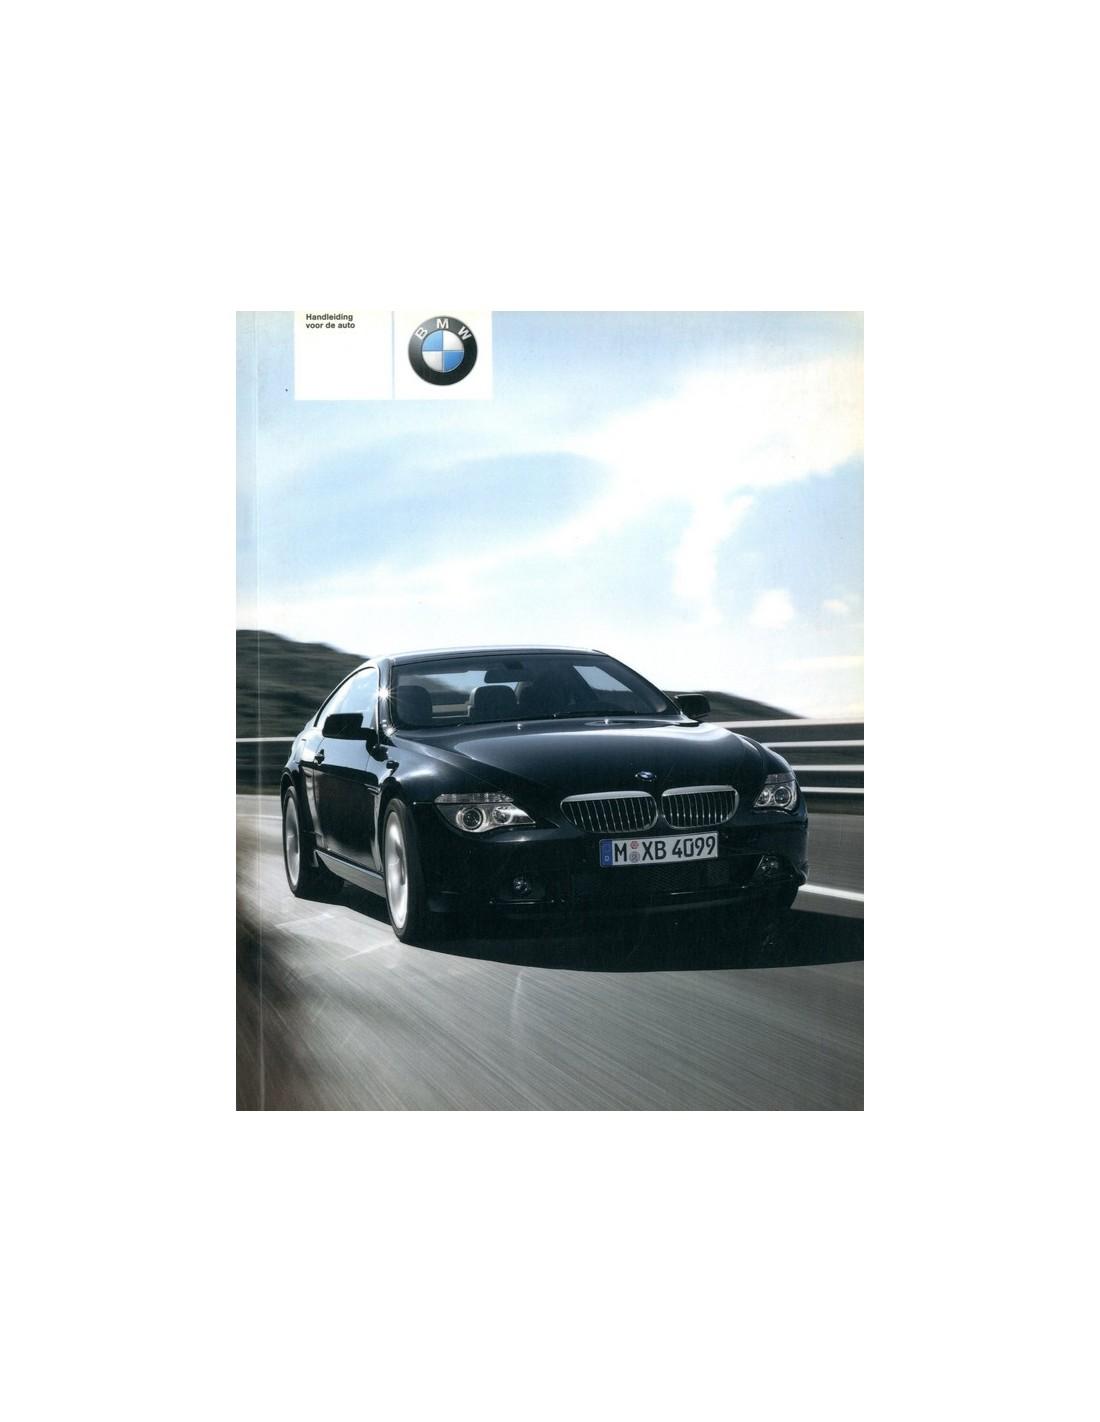 BMW SERIES OWNERS MANUAL DUTCH - 2003 bmw 6 series